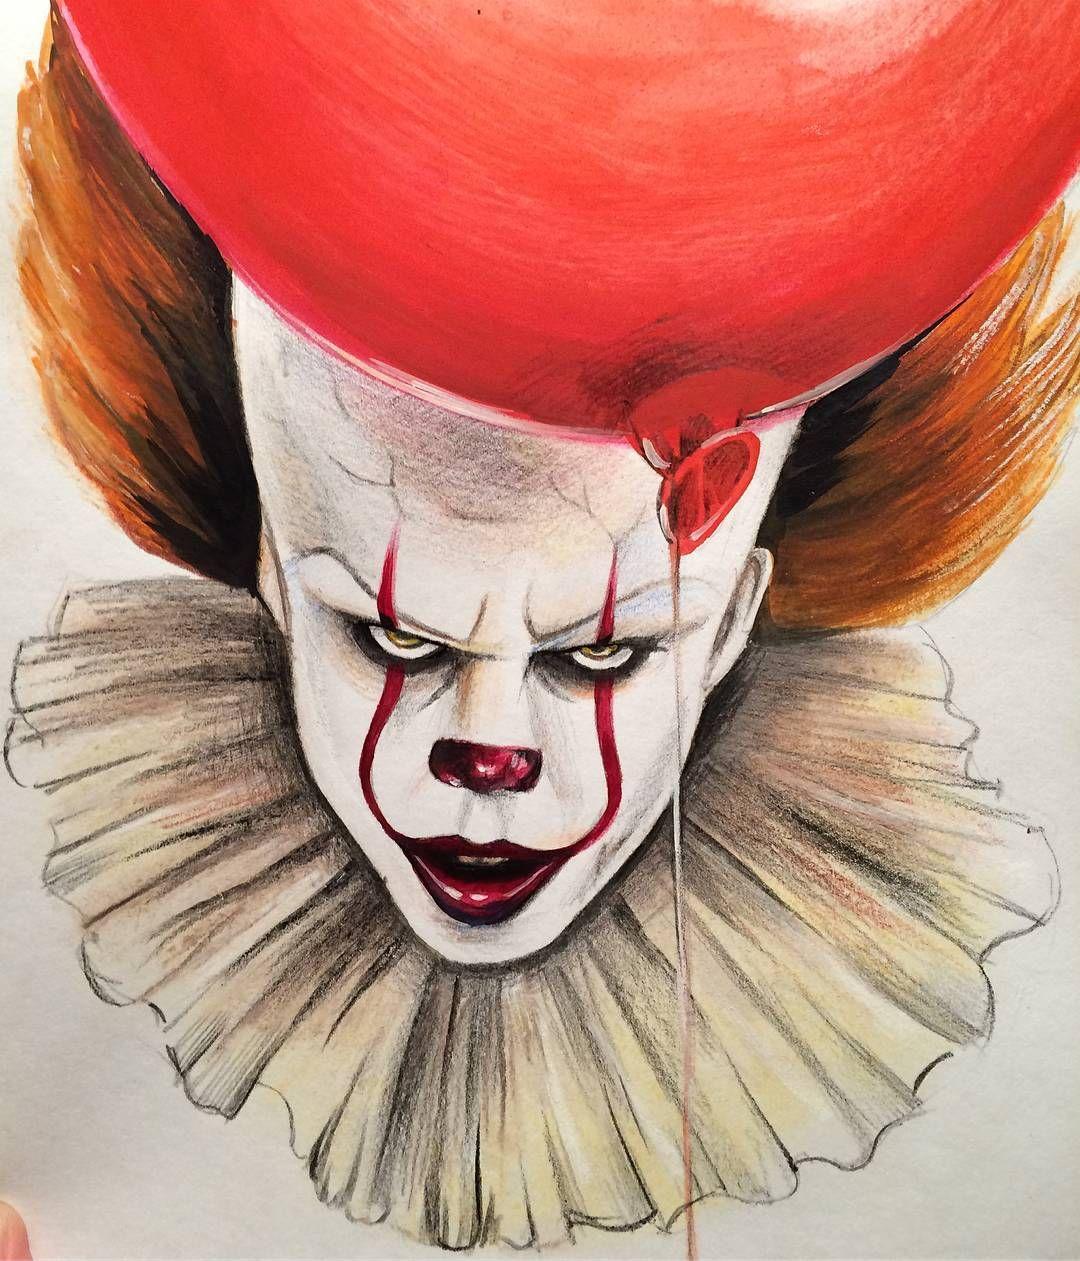 snls birthday clown sketch - 736×859